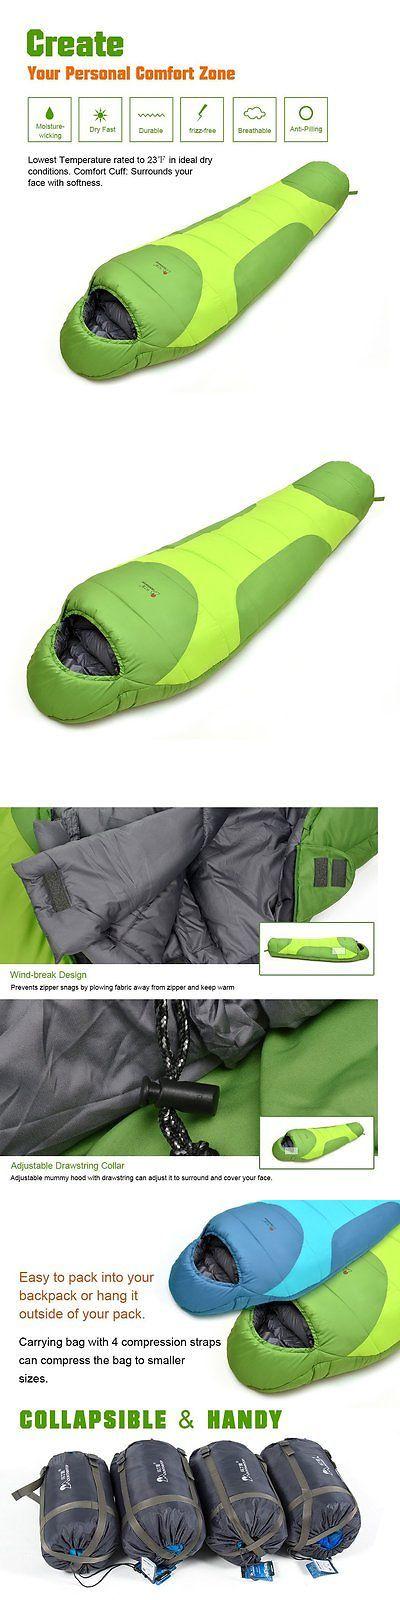 Sleeping Bags 87100: Mountaintop Mummy Sleeping Bag Lightweight Backpacking Sleeping Bags For Adults -> BUY IT NOW ONLY: $54.99 on eBay!